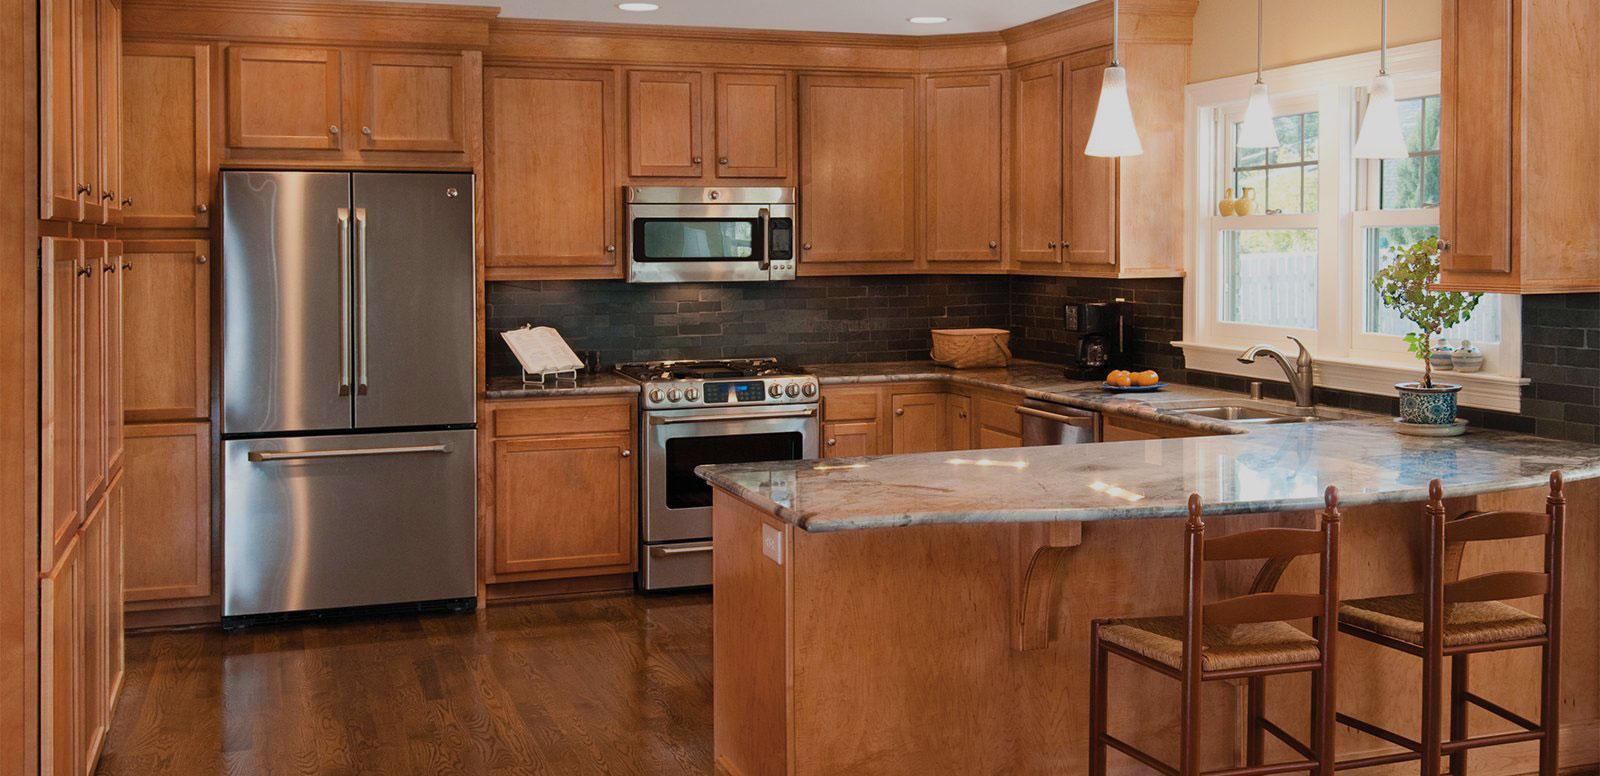 restore kitchen cabinets round table and chairs cabinet restoration antique furniture restorer